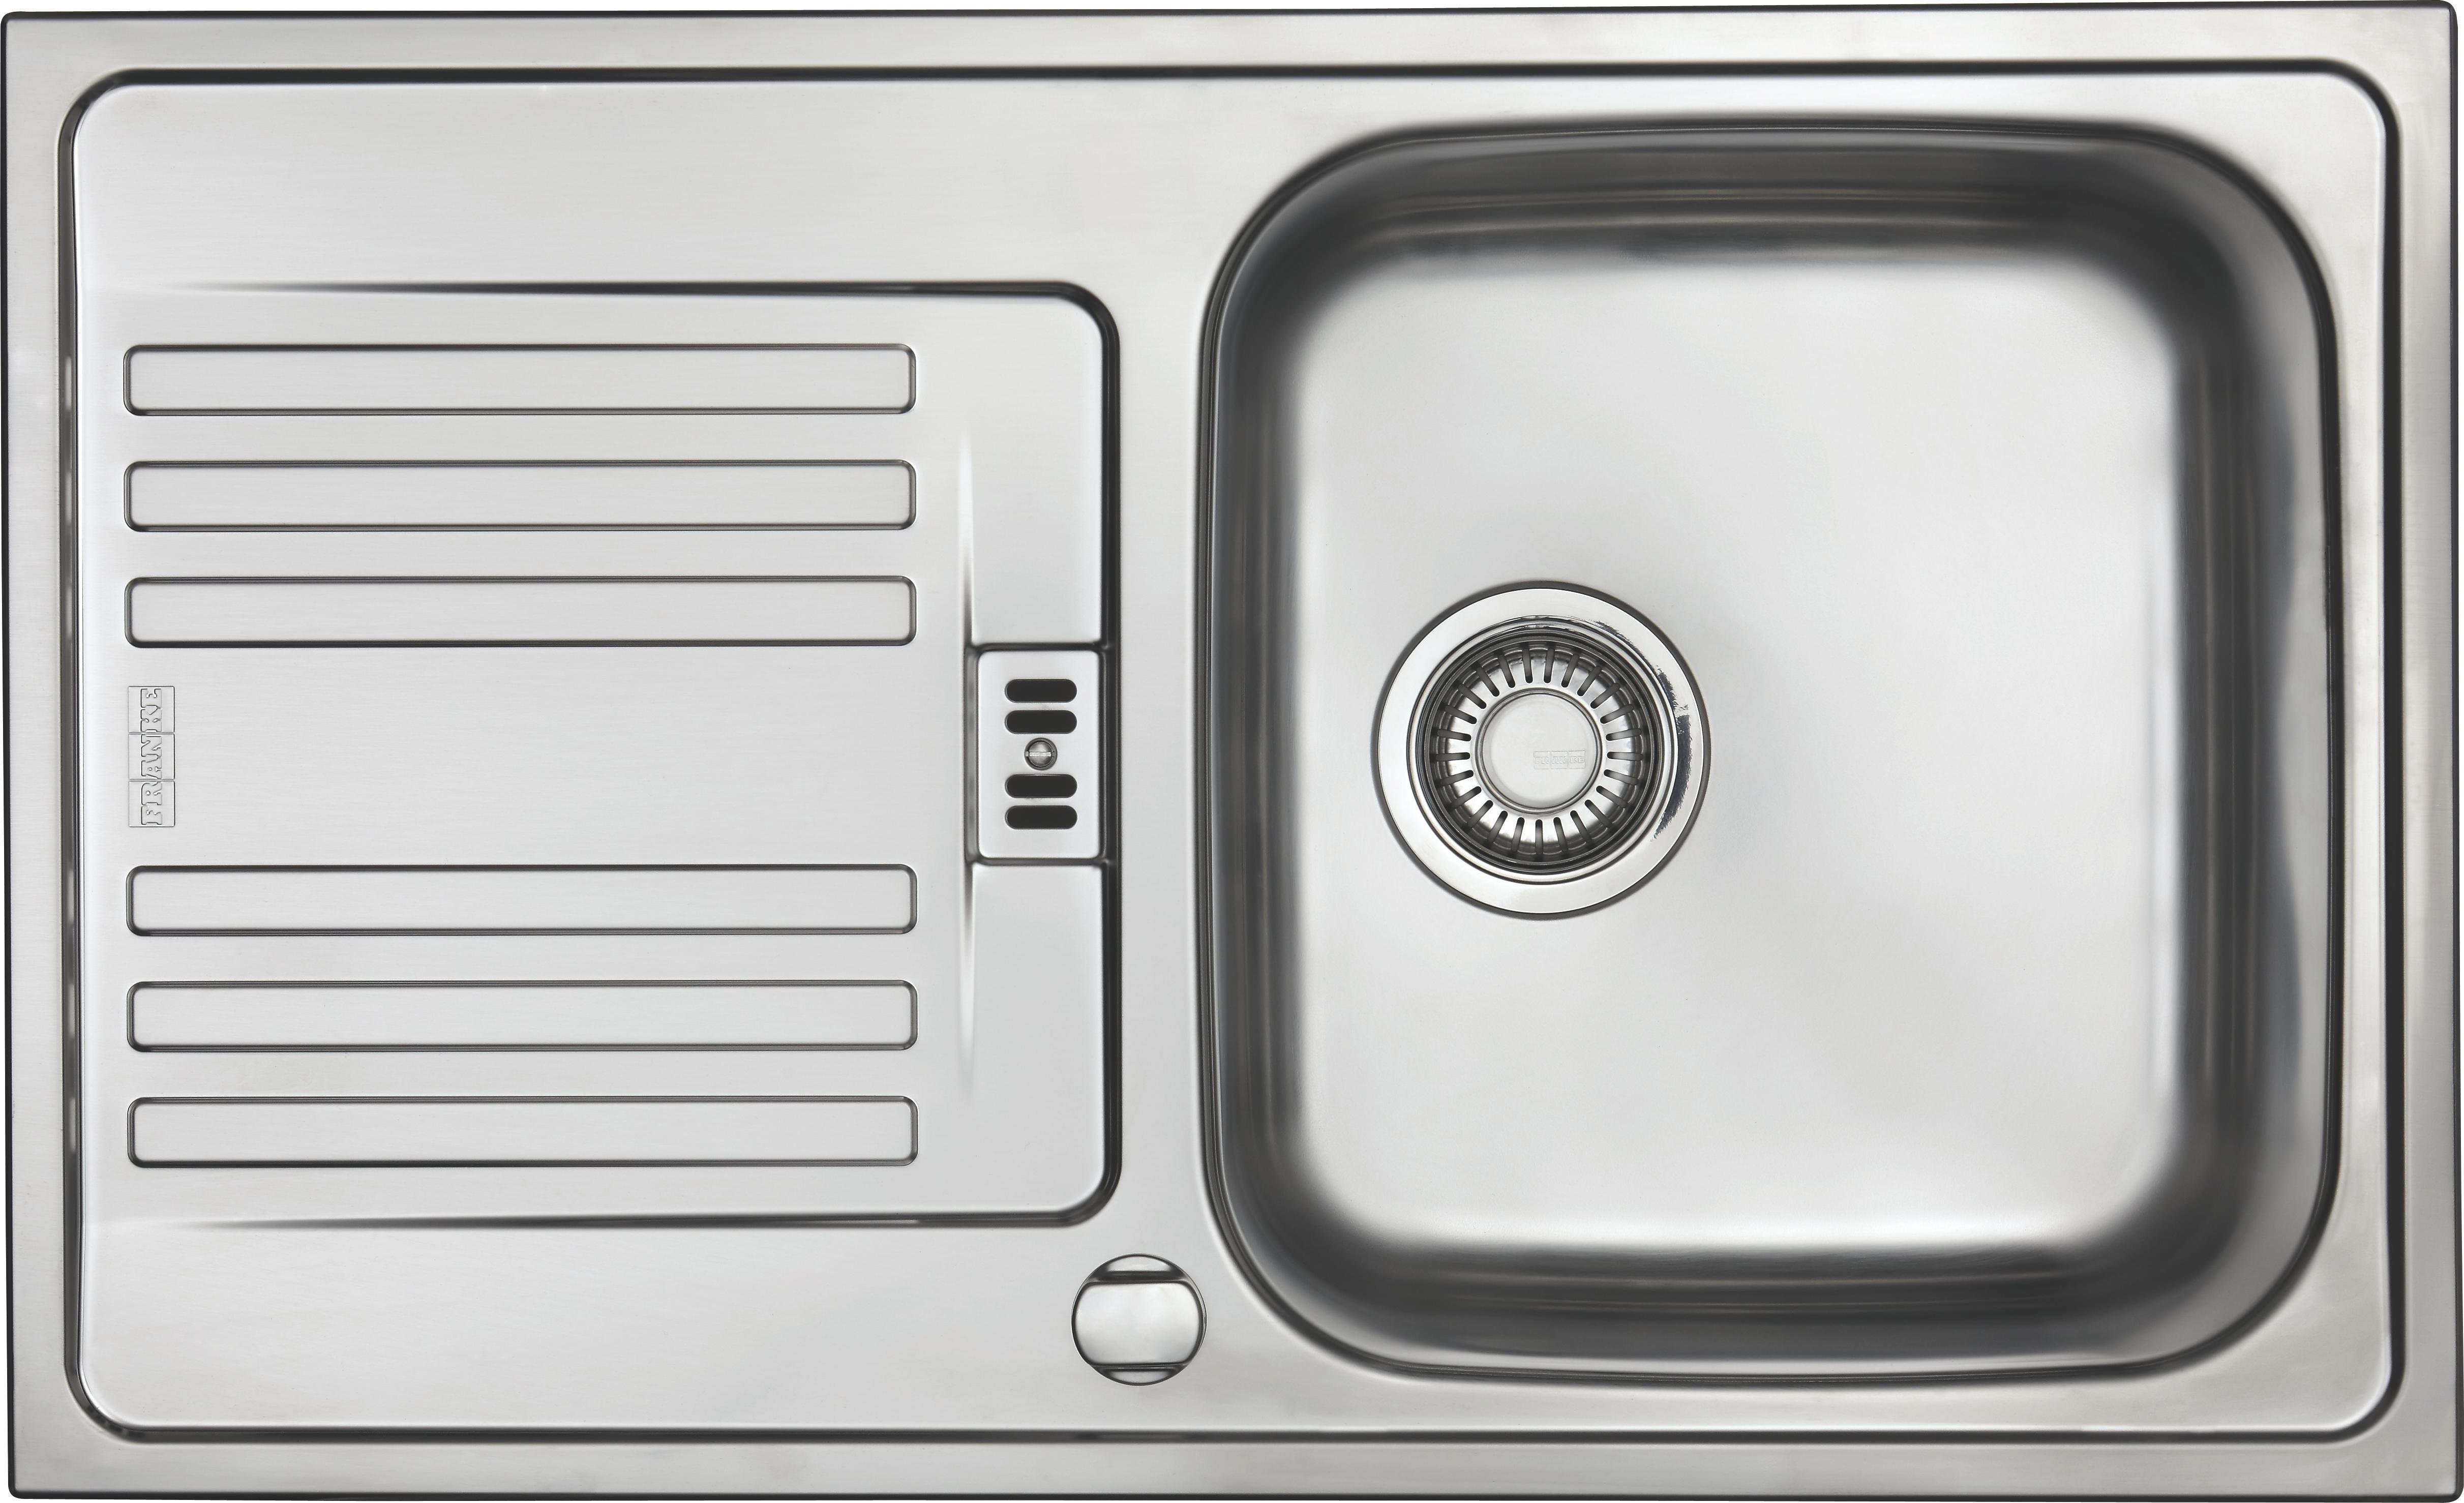 Spüle Euroform Efx614-78 online kaufen ➤ mömax